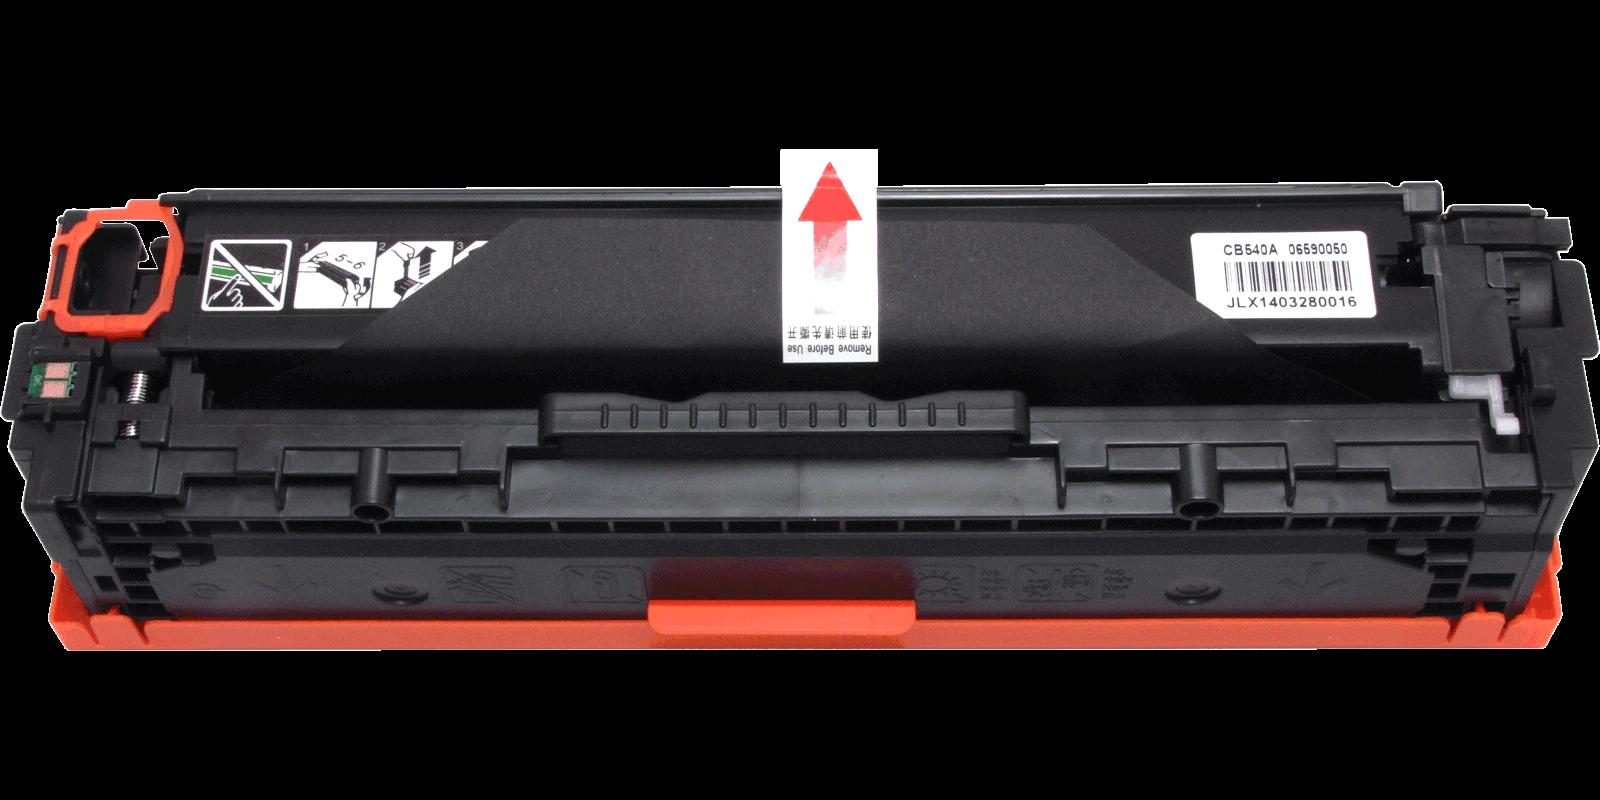 ULTRA №125A CB540A/Cartridge 316, 716, 416, 116 черный, для HP/Canon, до 2200 стр.